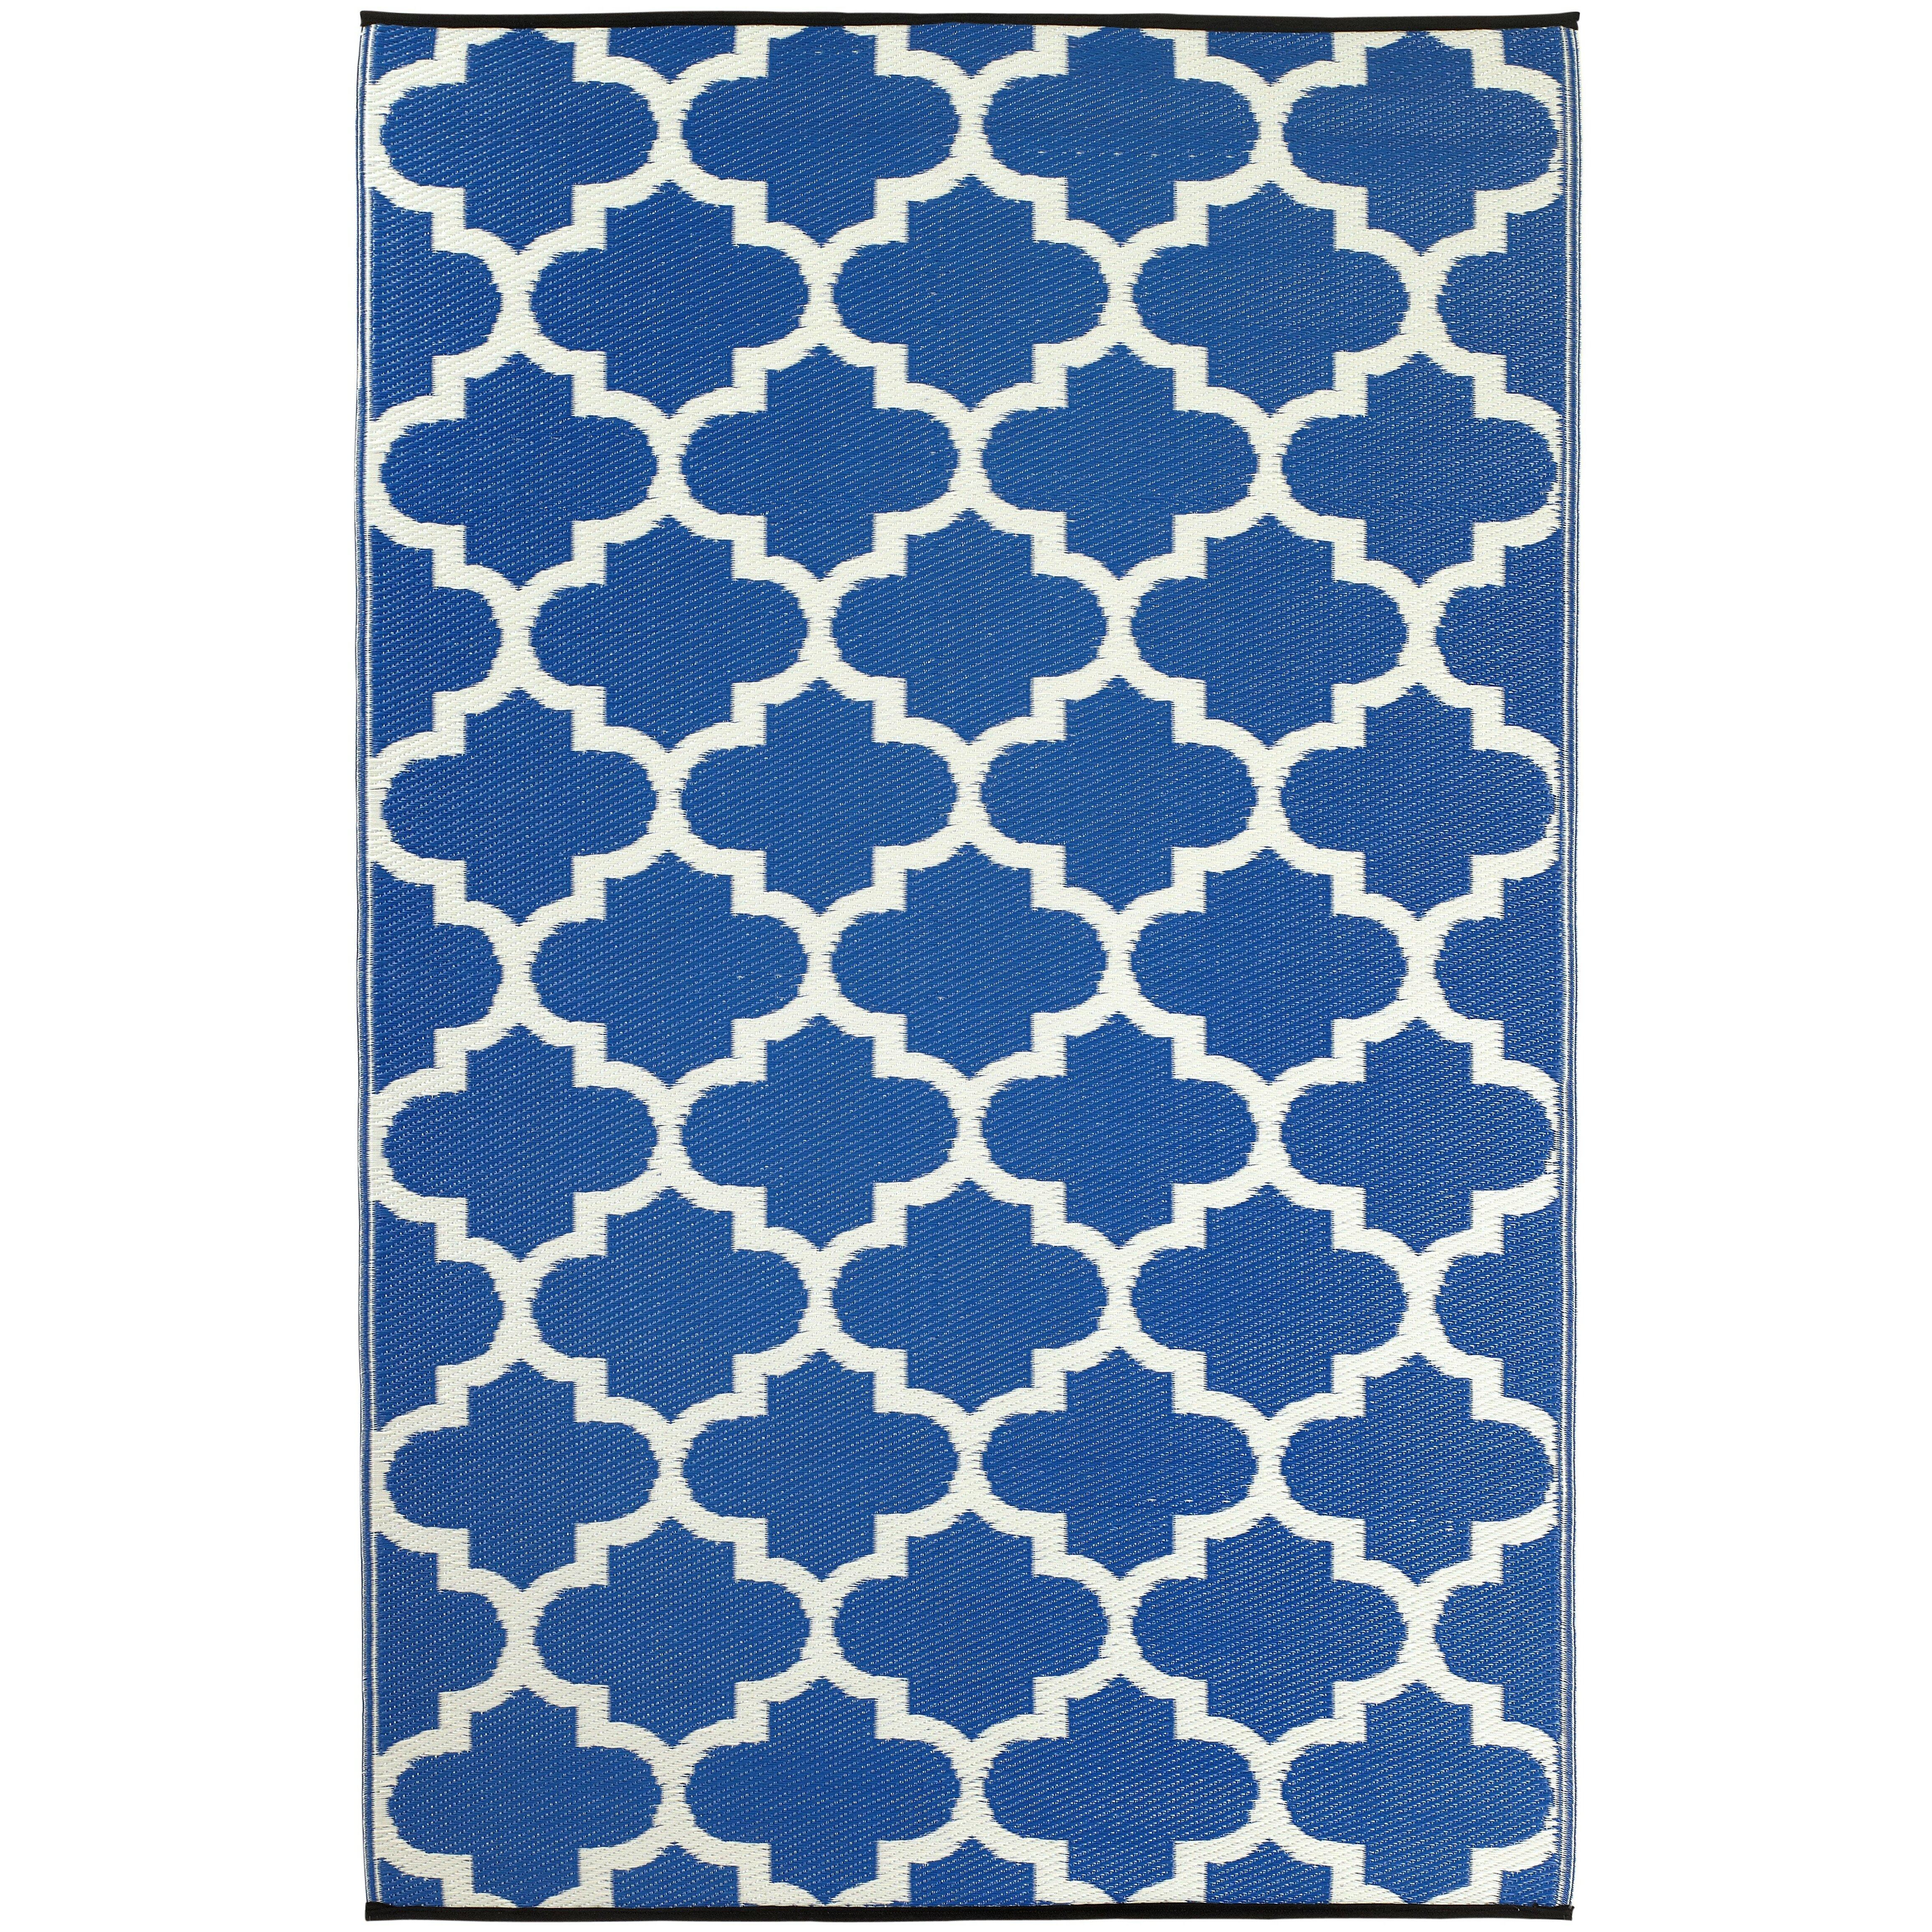 Fab Rugs World Tangier Regatta Blue & White Indoor Outdoor